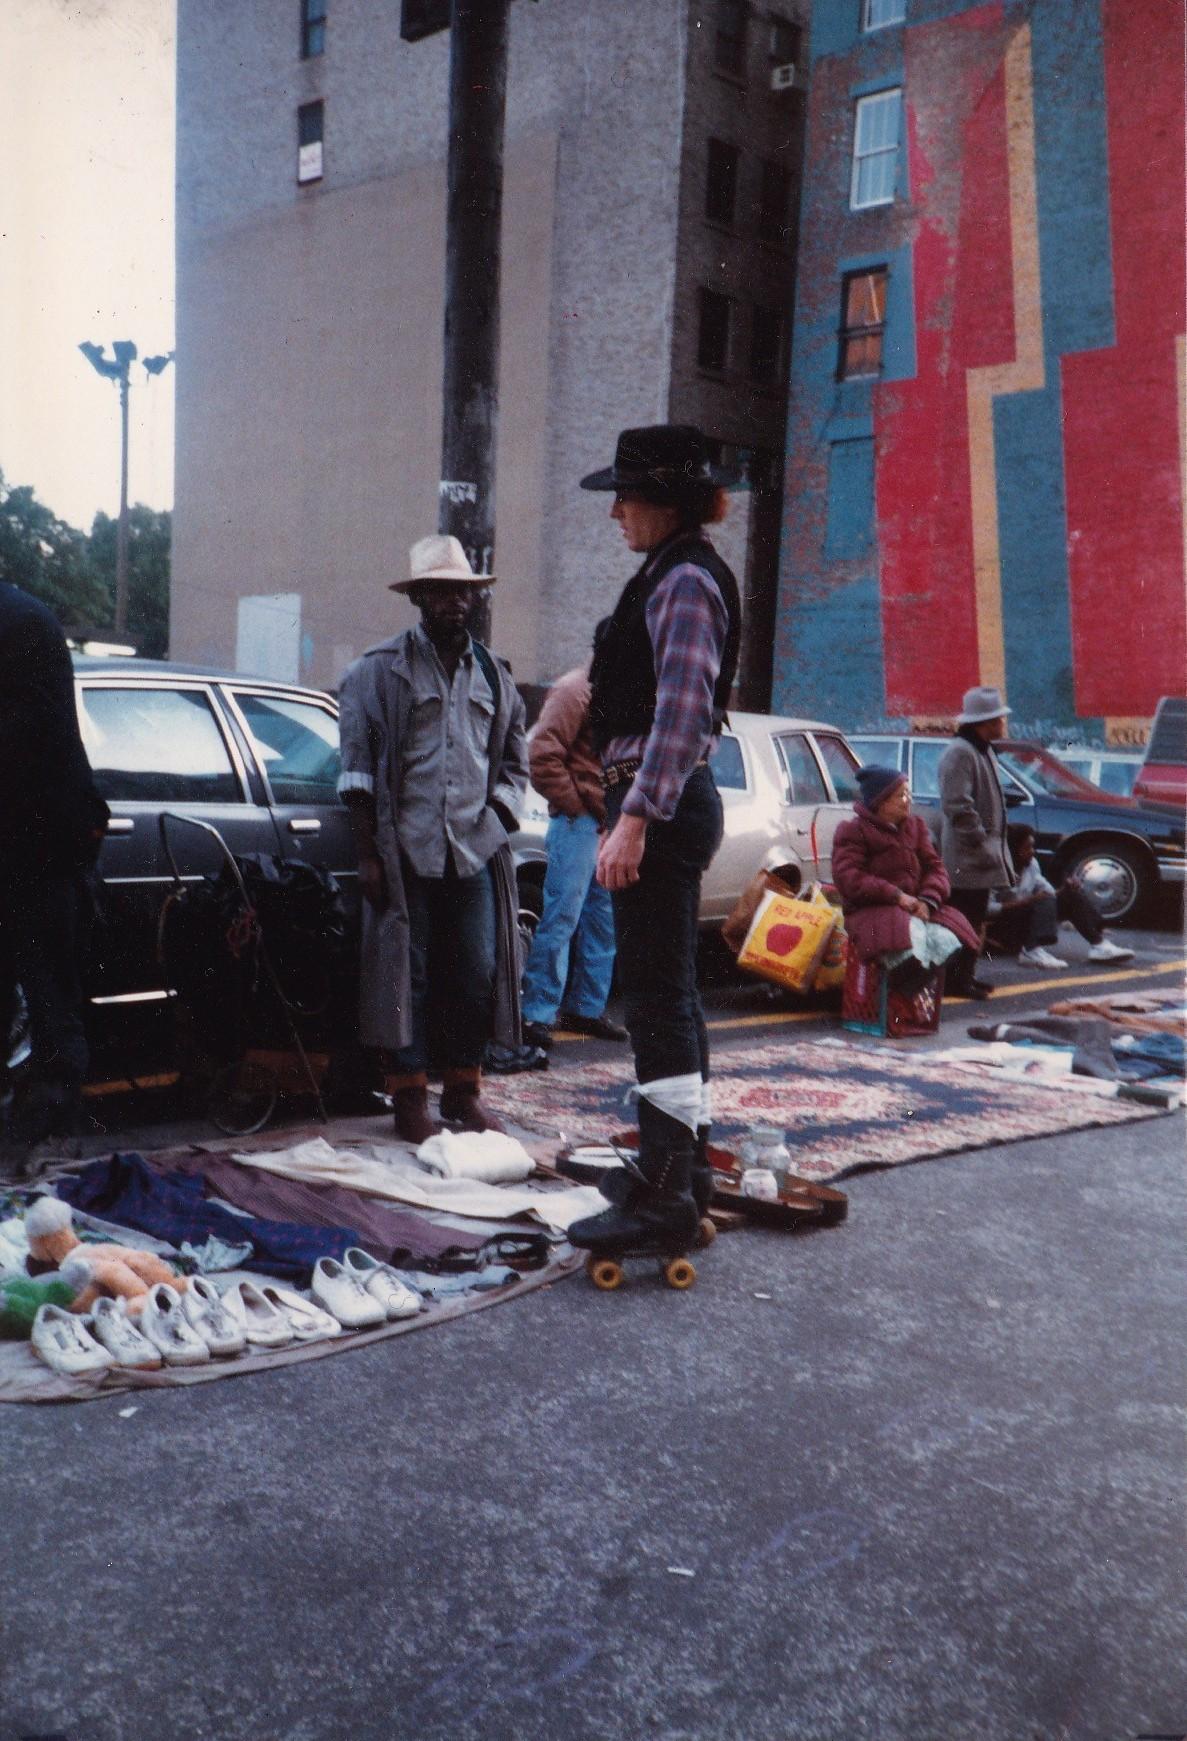 Roller skates york - Wheel Thing A Cowboy On Roller Skates Speaks To People Selling Their